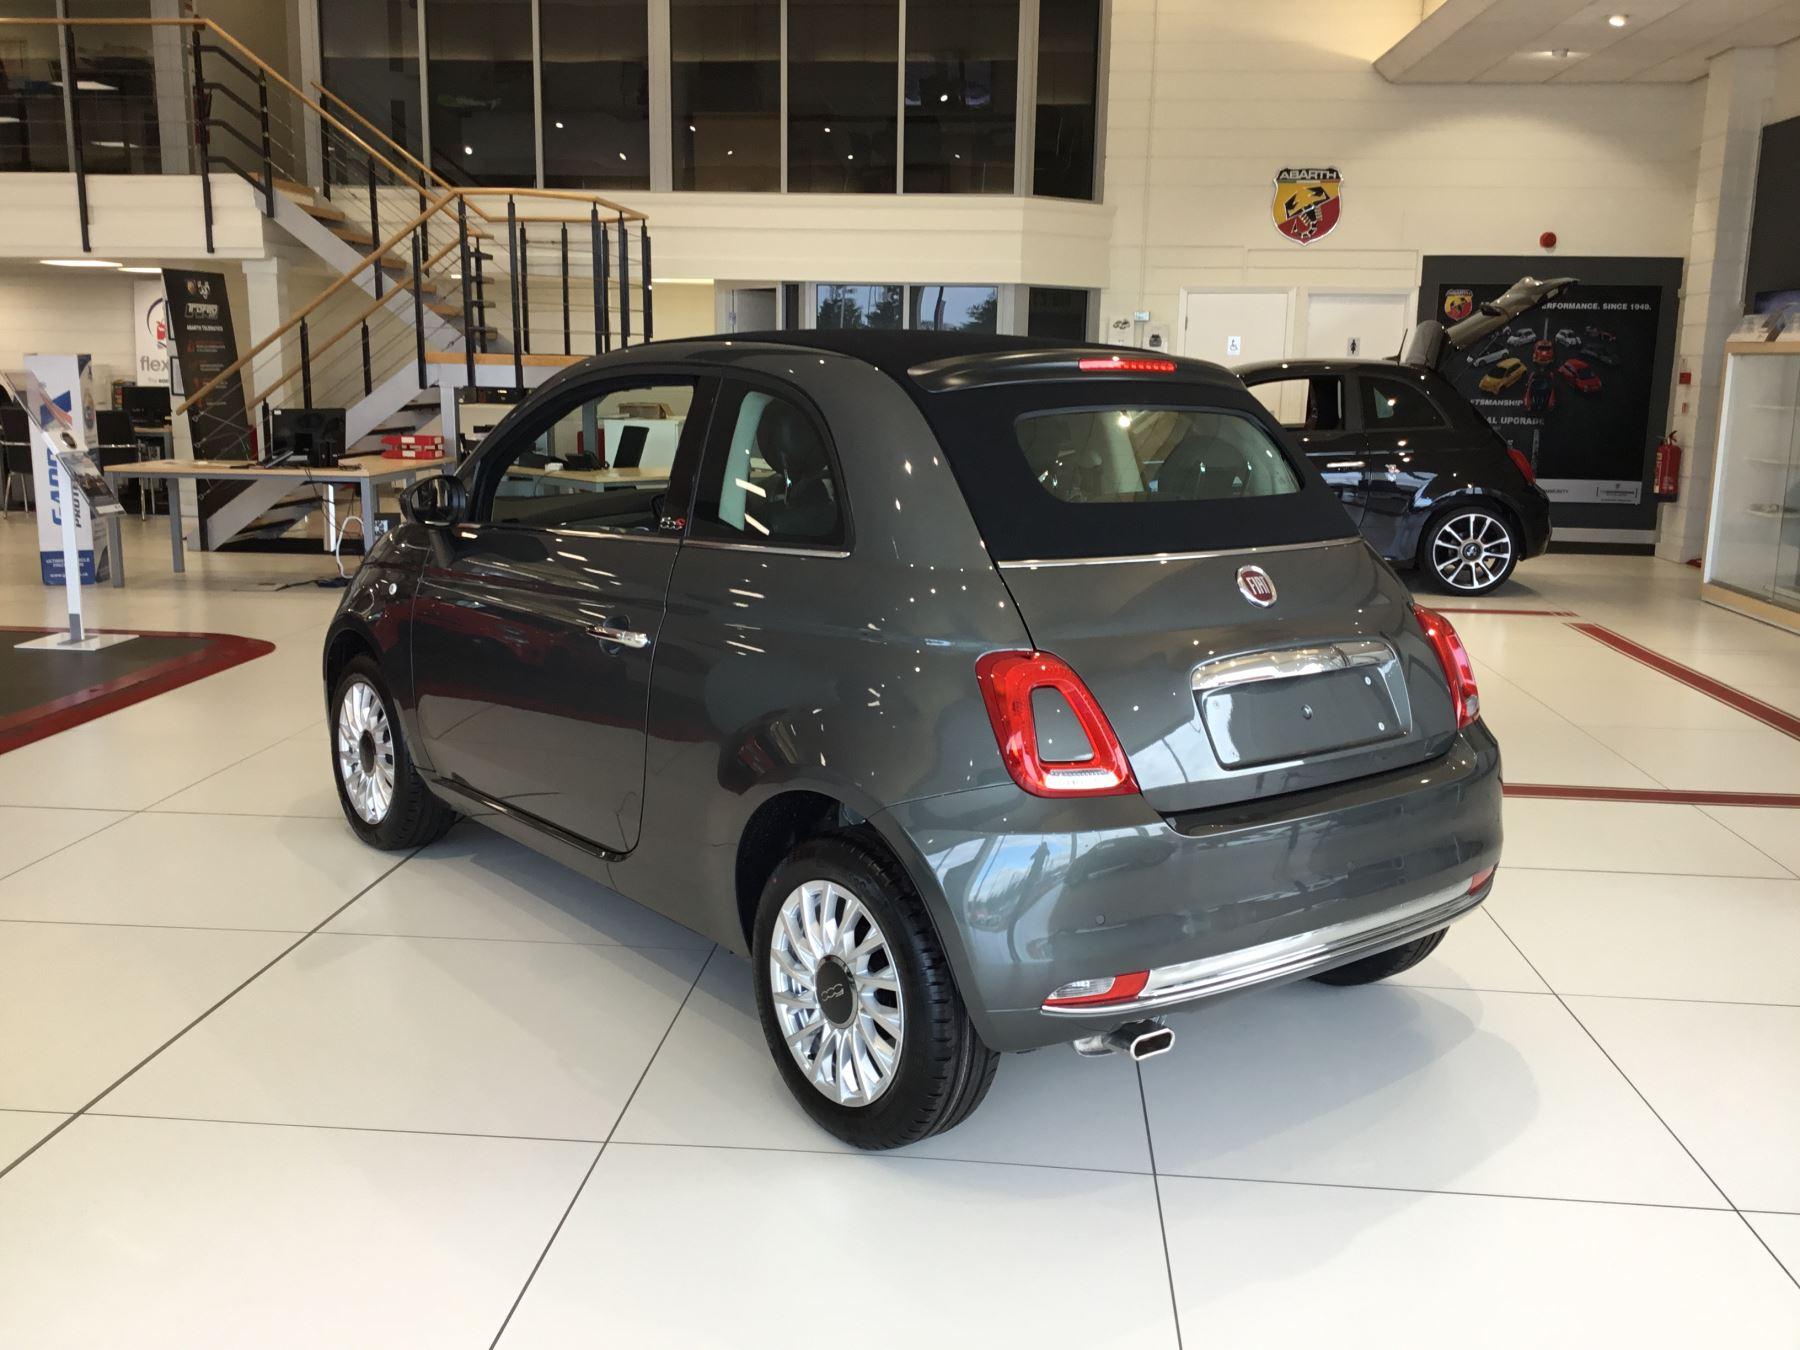 Fiat 500 1.2 Lounge 2dr image 7